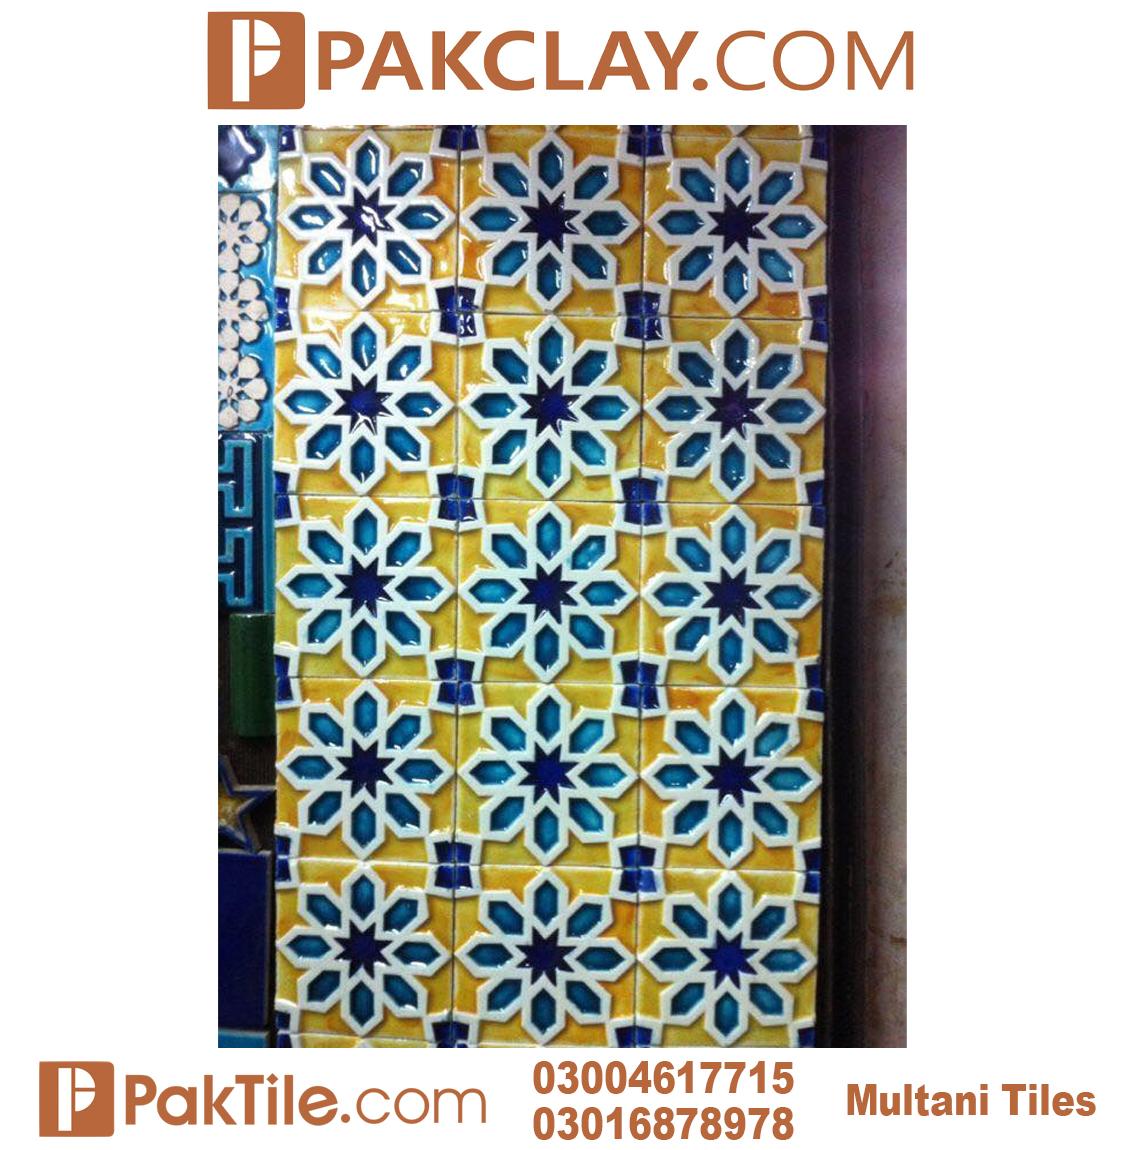 10 Pak clay wall tiles shop online multani tiles price